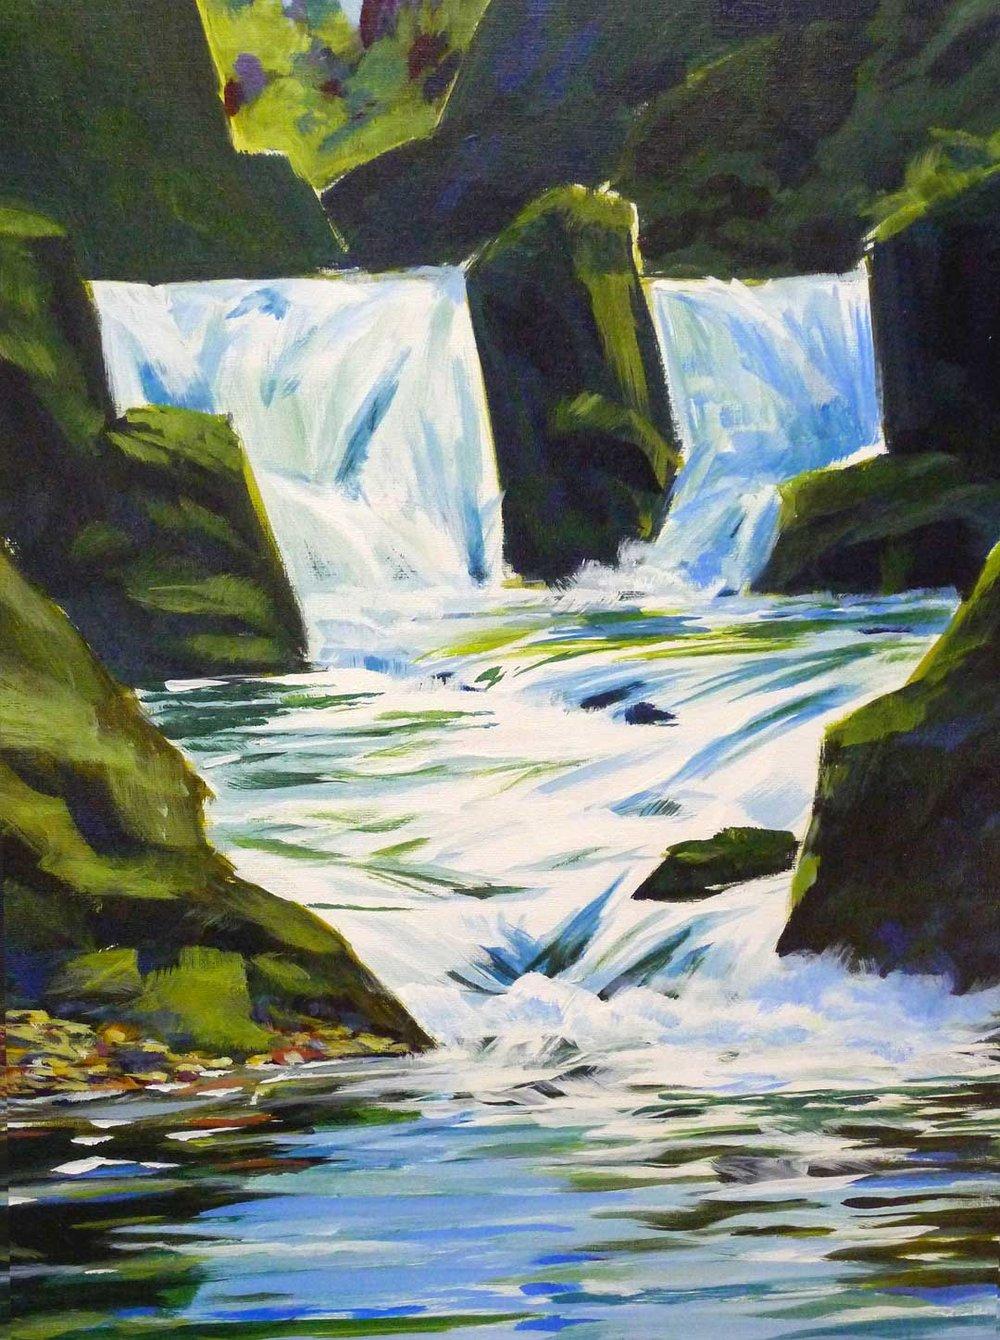 waterfall-paint-demo-8.jpg